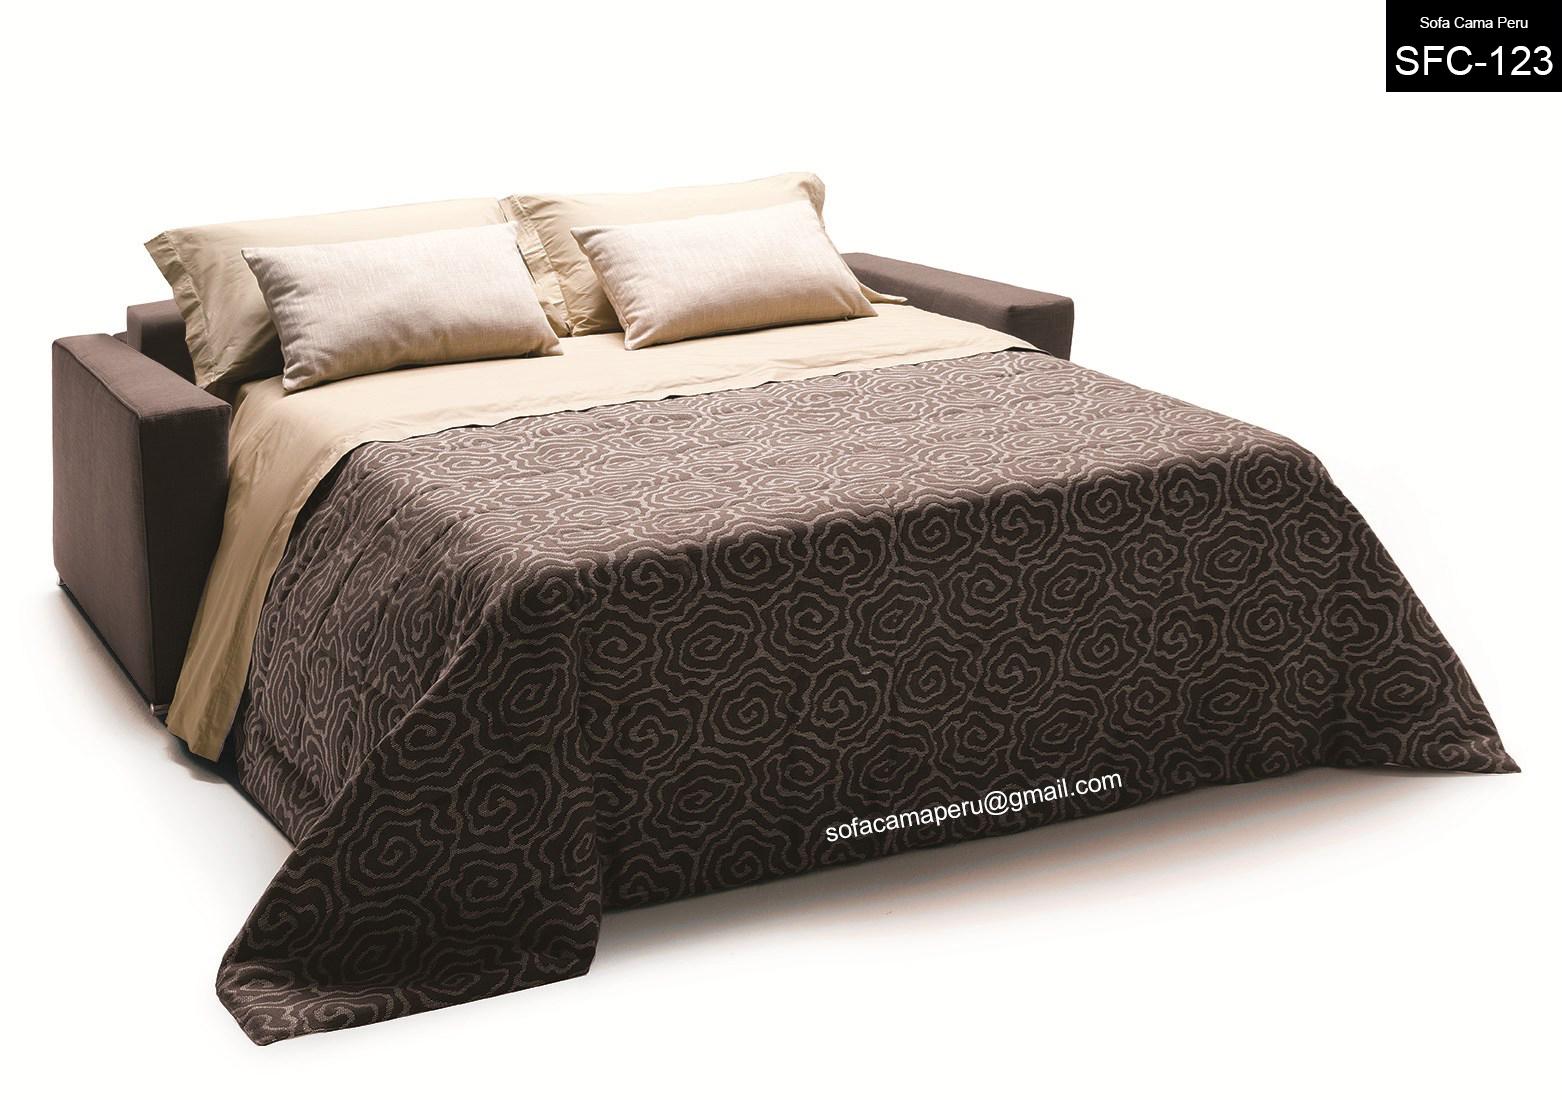 Sofa Sfc Ikea Square Table Cama Peru Muebles Sofas A Pedido Diseño De